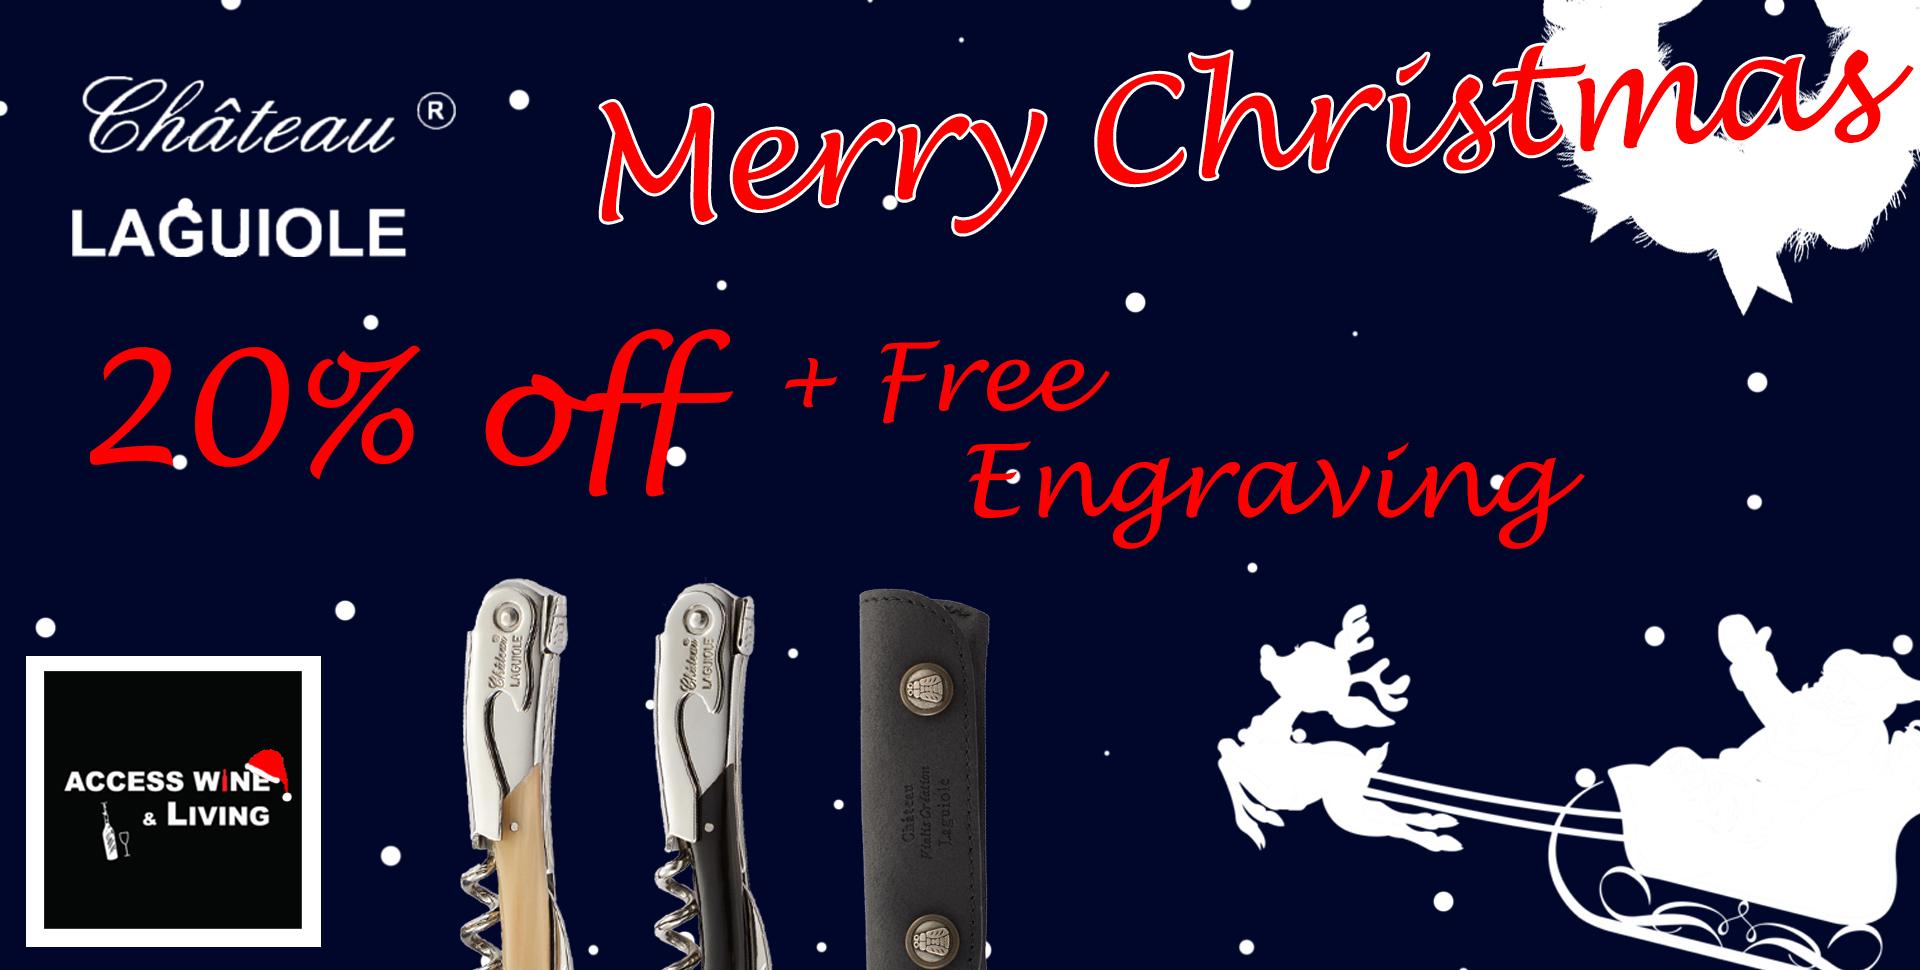 france, chateaulaguiole, 侍酒刀, 耶誕節, 聖誕節, merry, christmas, gift, engrave, 刻字, 手工, 高級, highclass,